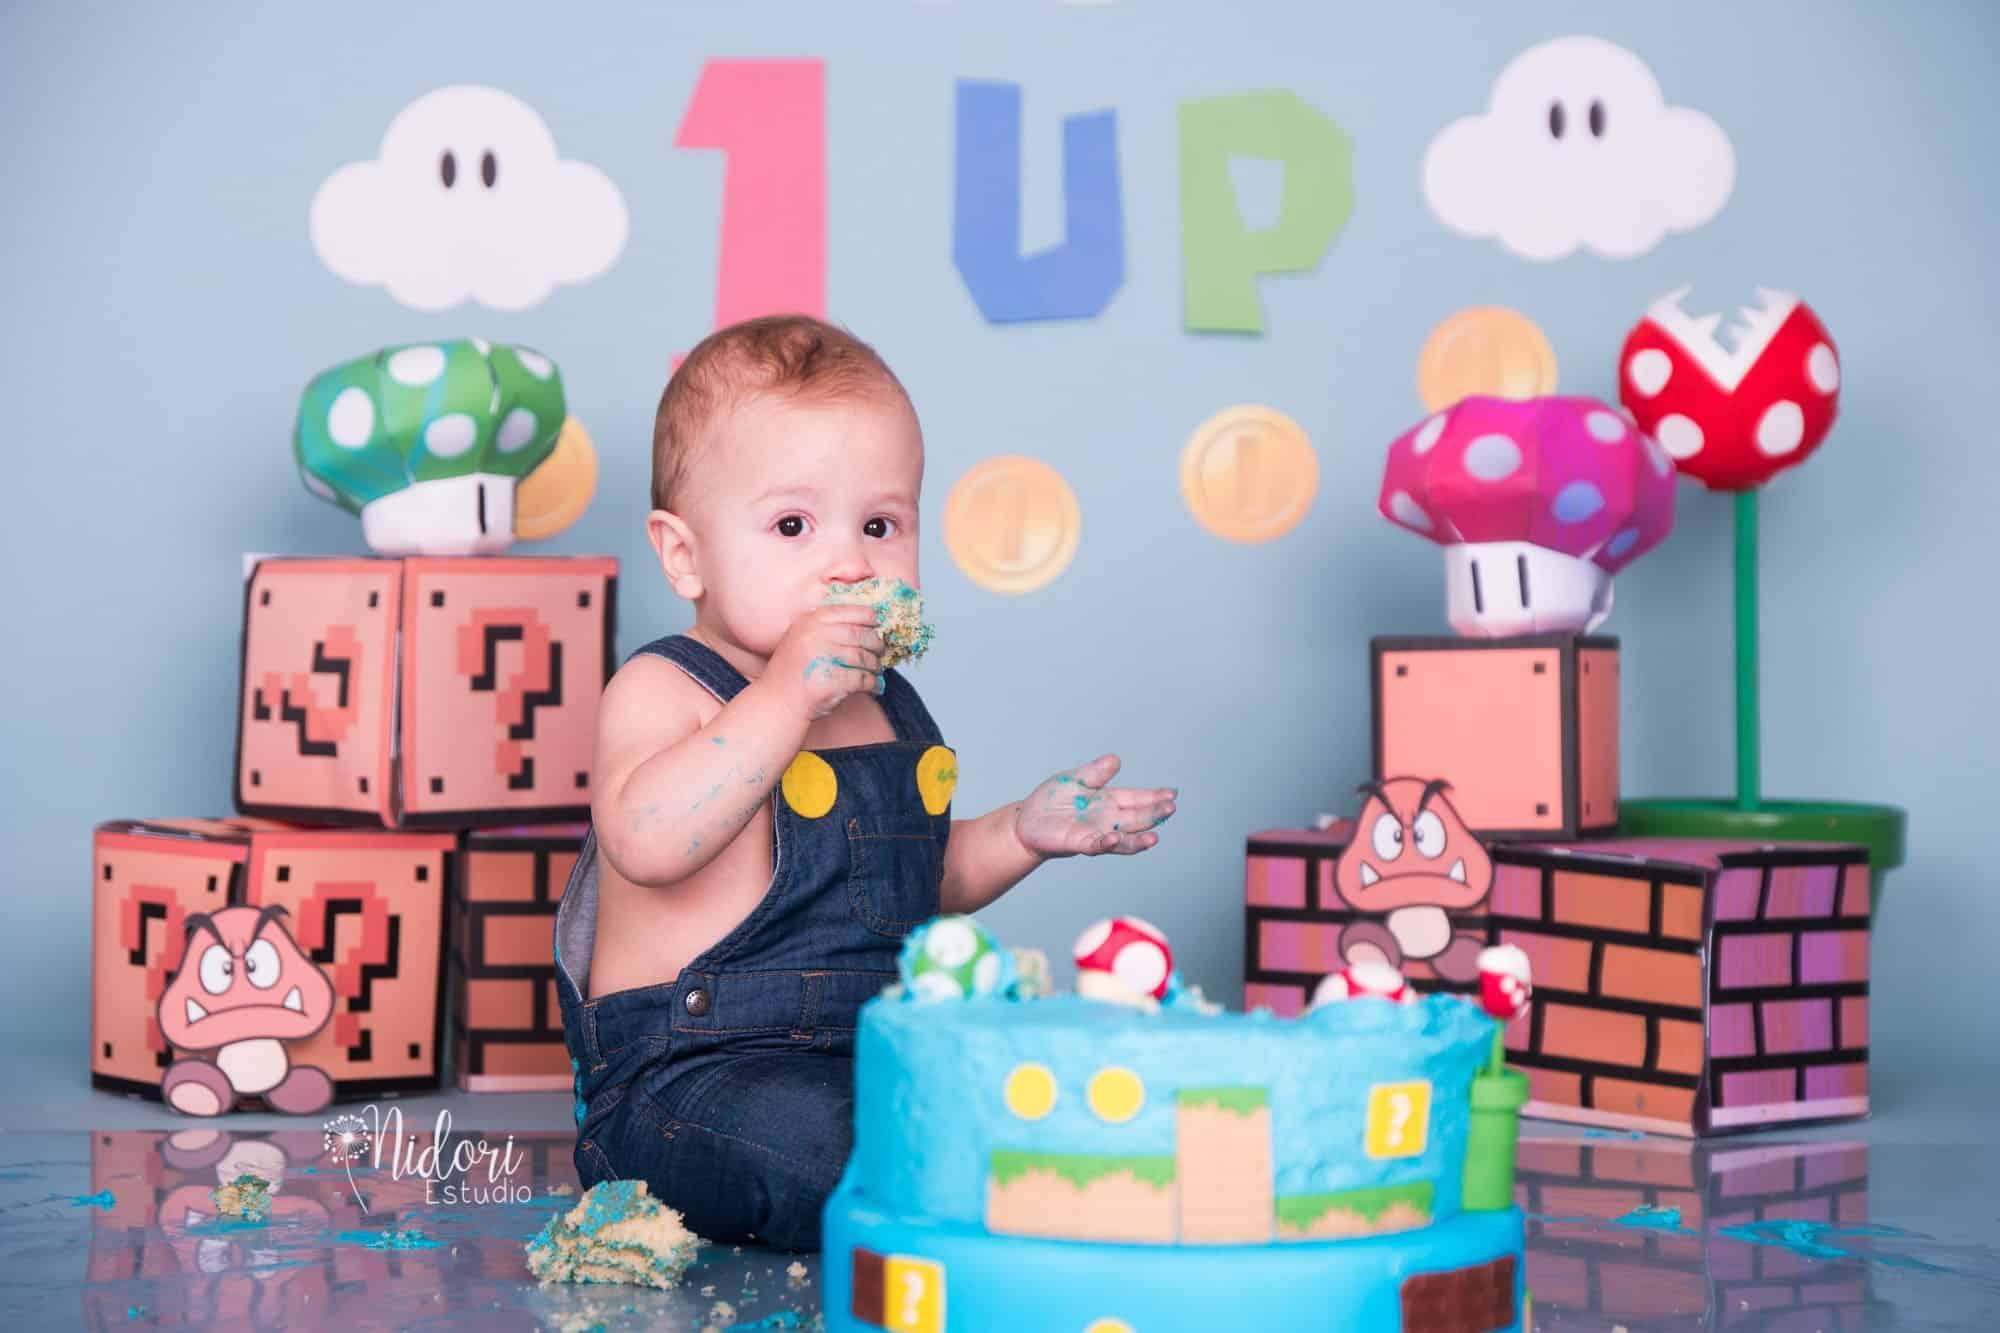 smash-cake-cumpleaños-tarta-fotografia-niños-bebes-nidoriestudio-fotos-valencia-almazora-castellon-españa-spain-04